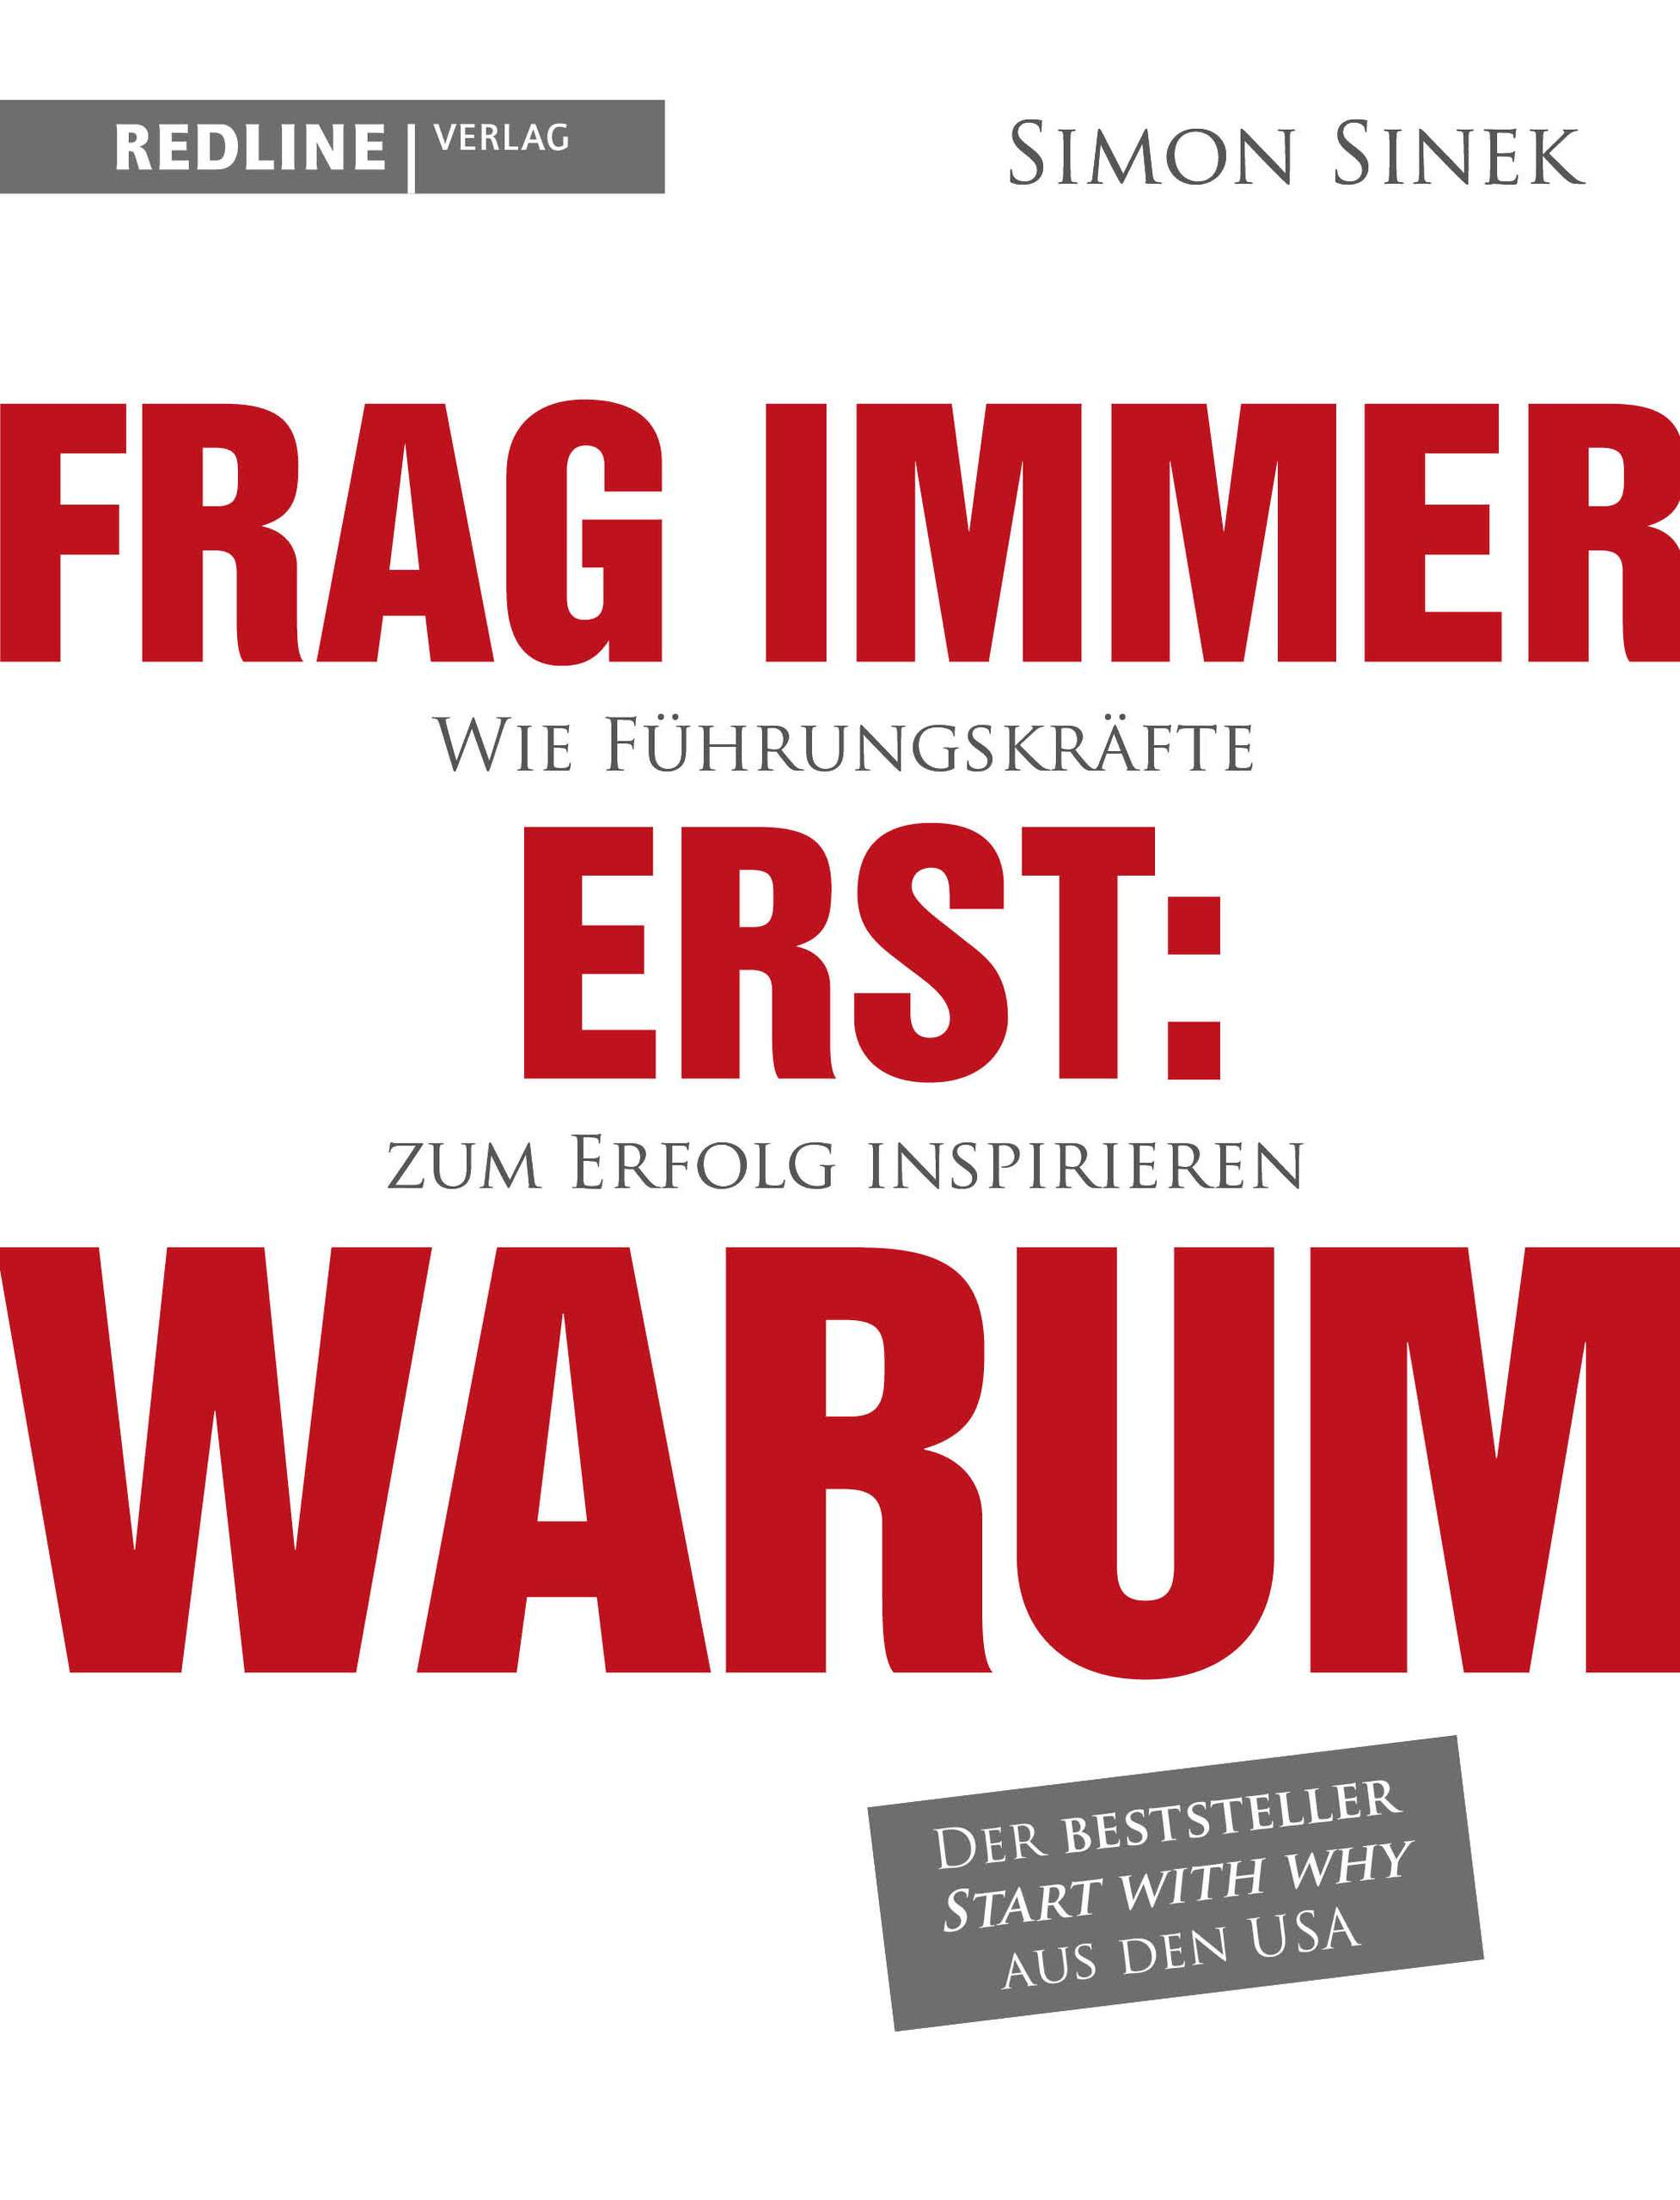 """Frag immer erst: warum"" von Simon Sinek © Redline Verlag Yogannetteblog.de"